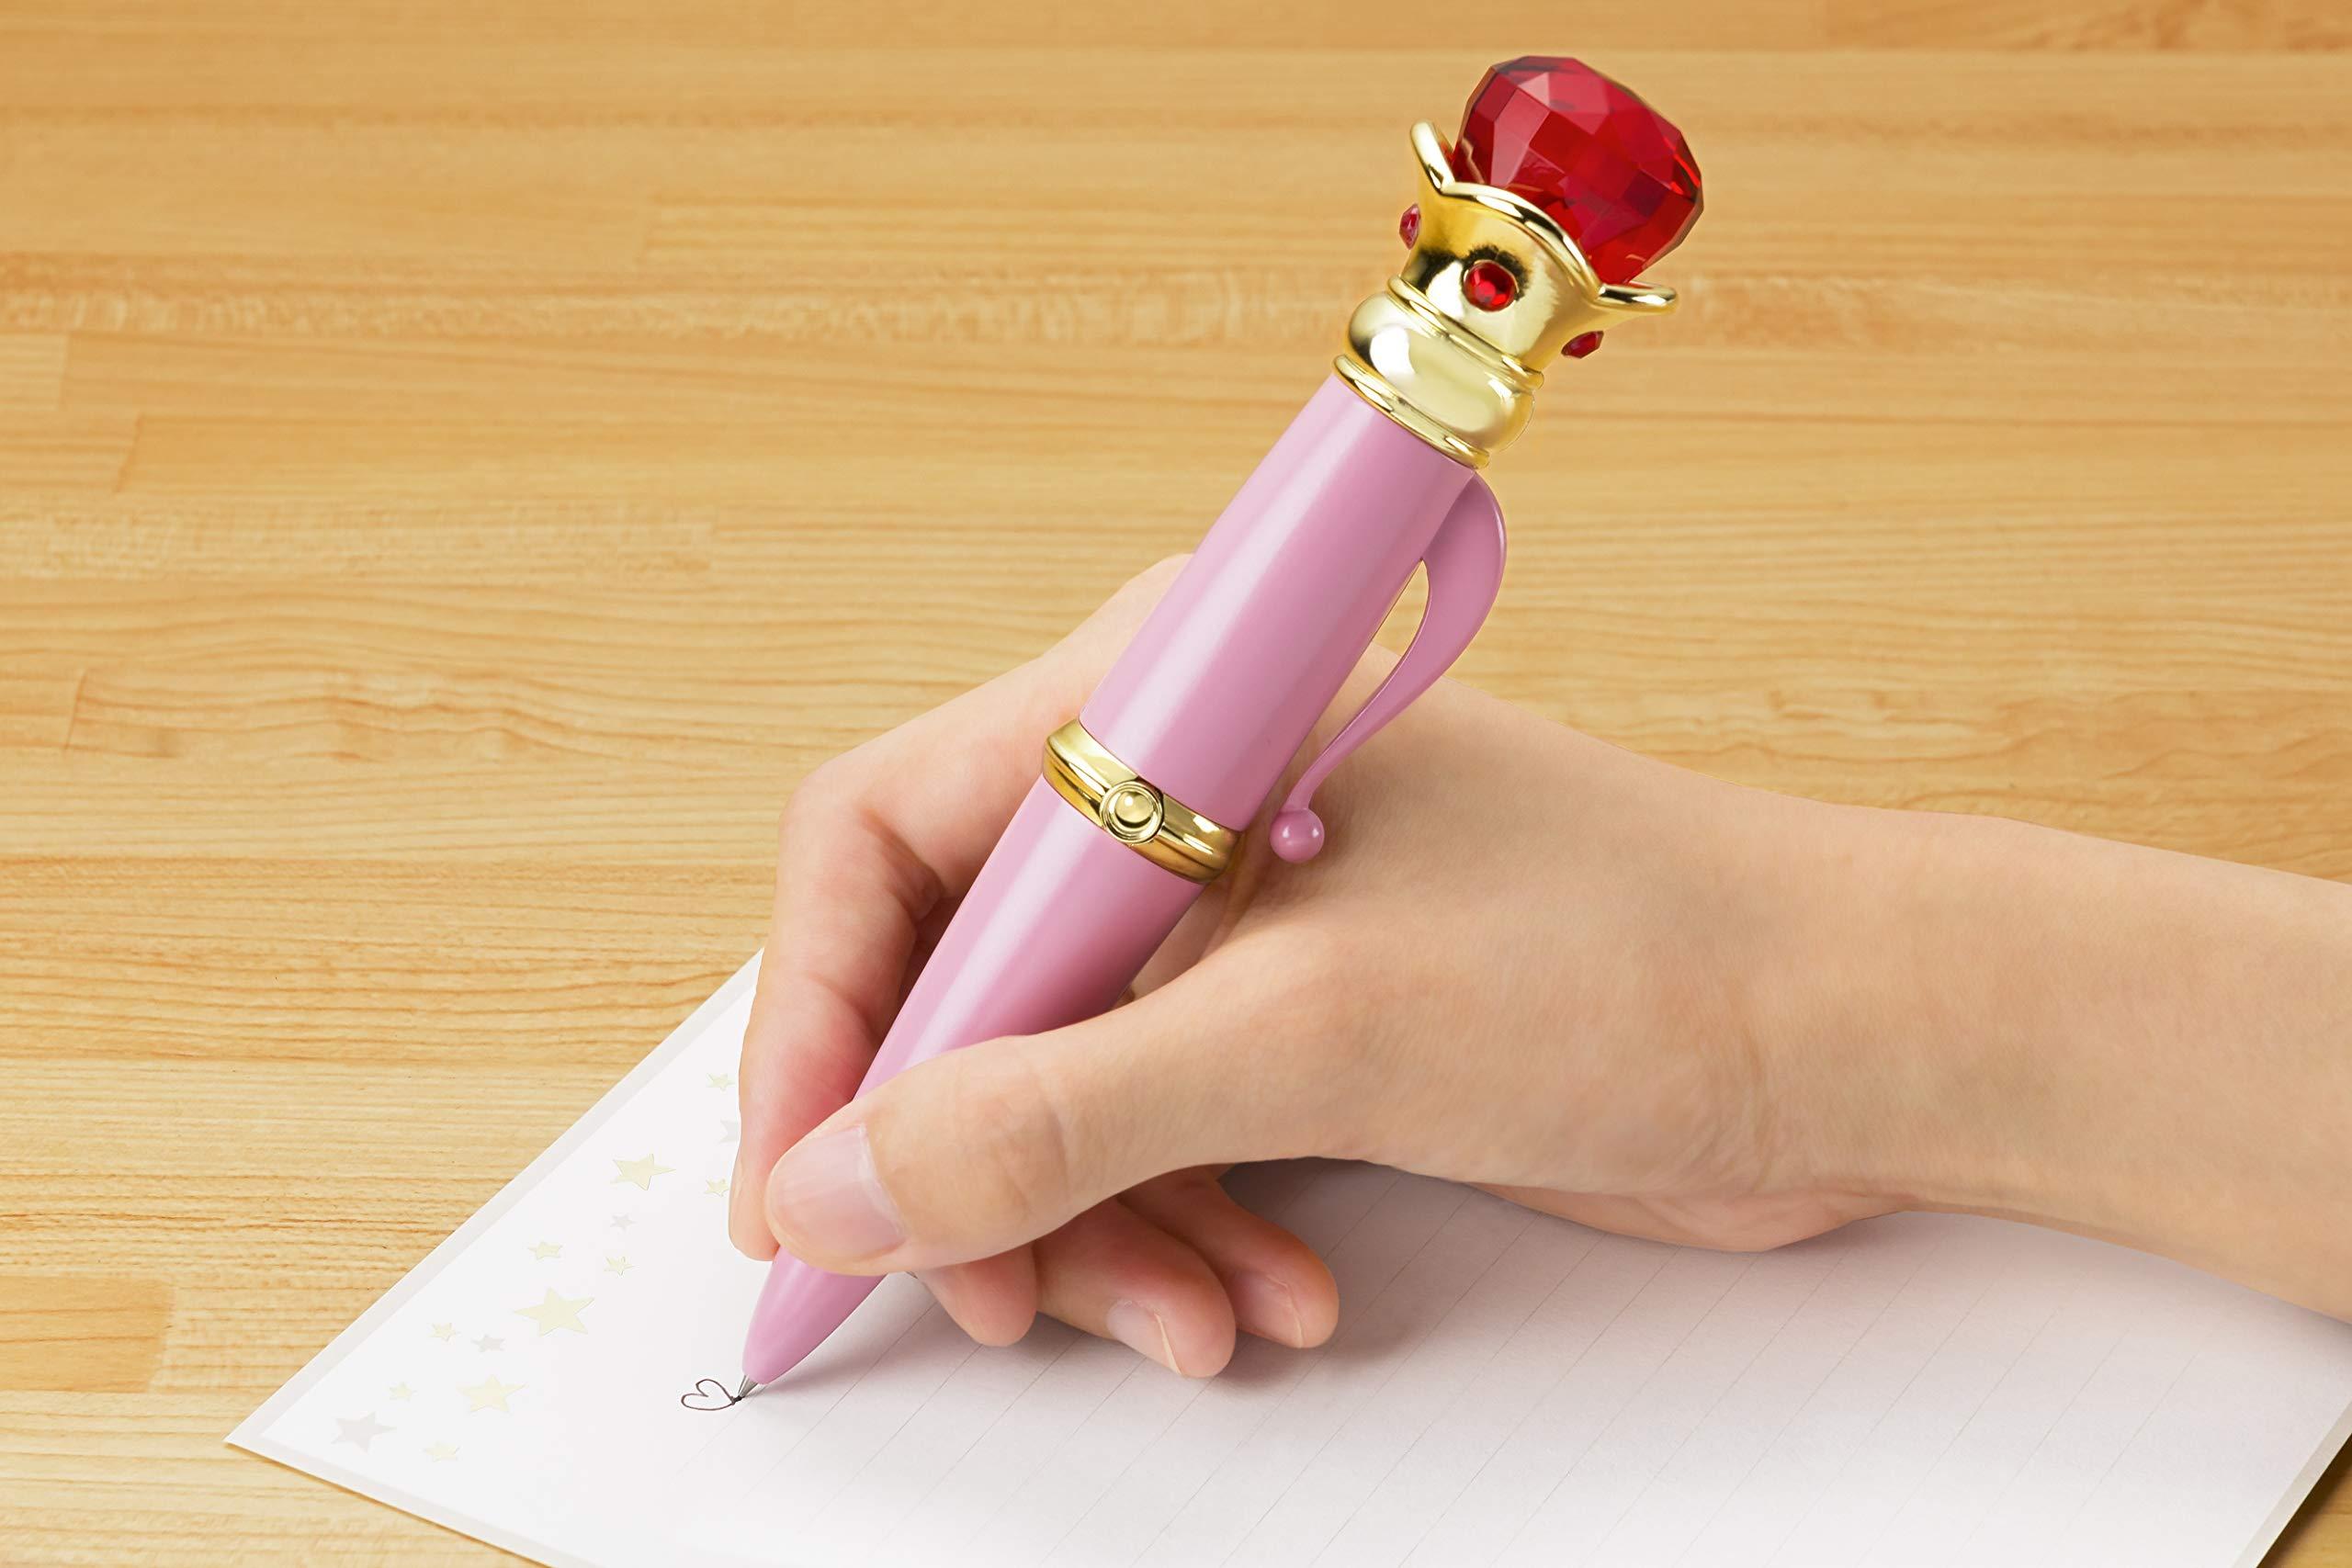 Bandai Tamashii Nations Proplica Transformation Brooch & Disguise Pen Set ''Sailor Moon'' Statue by Tamashii Nations (Image #5)